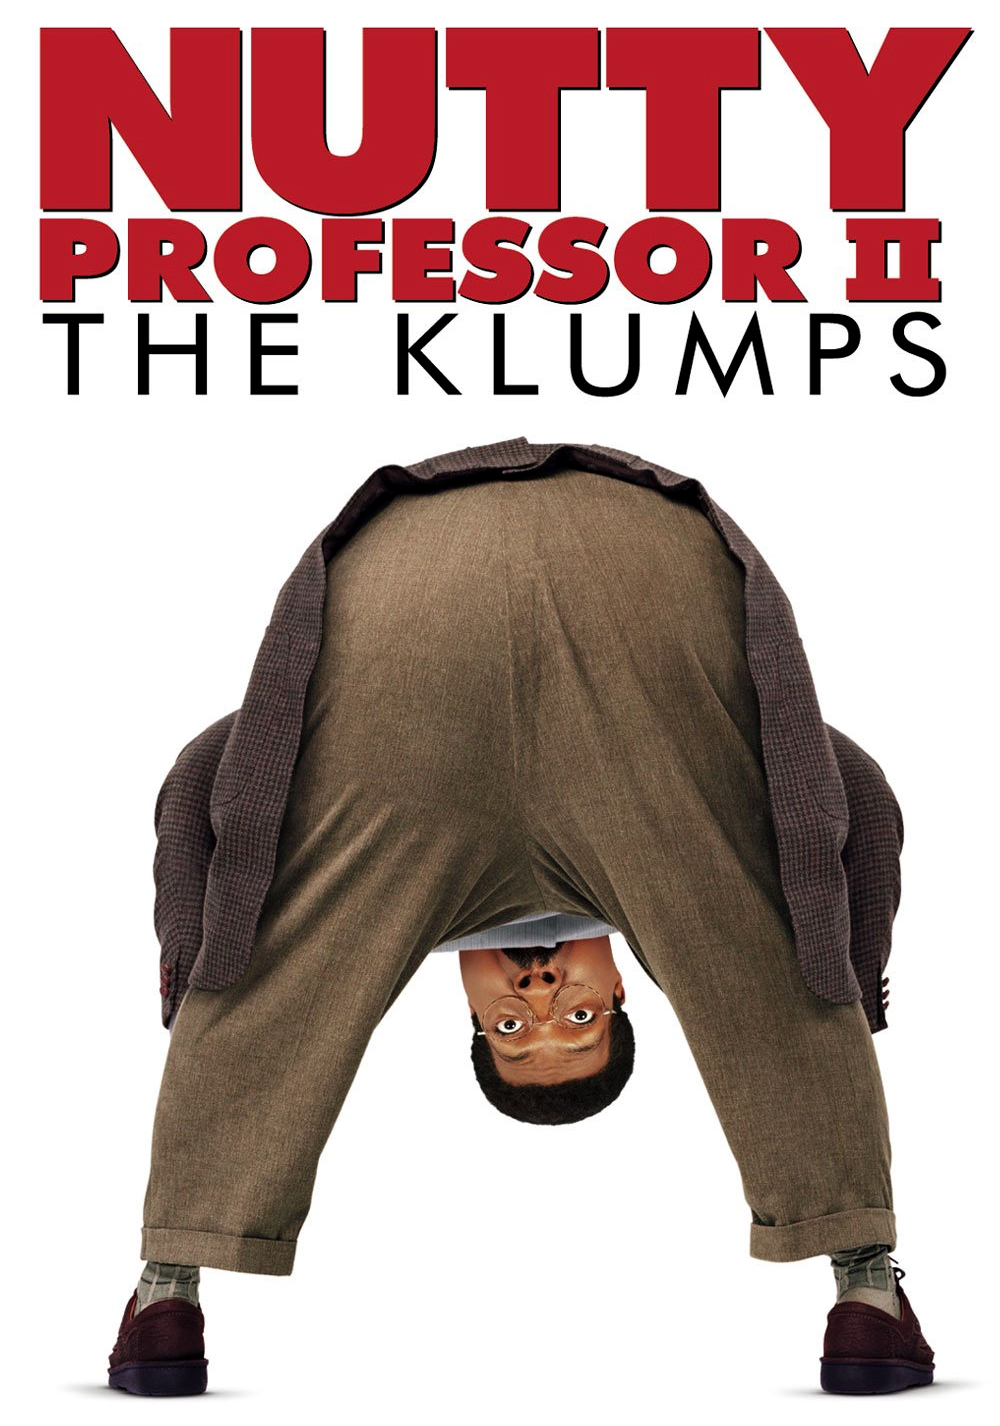 the-nutty-professor-ii-the-klumps-56dc76e281a0e.jpg